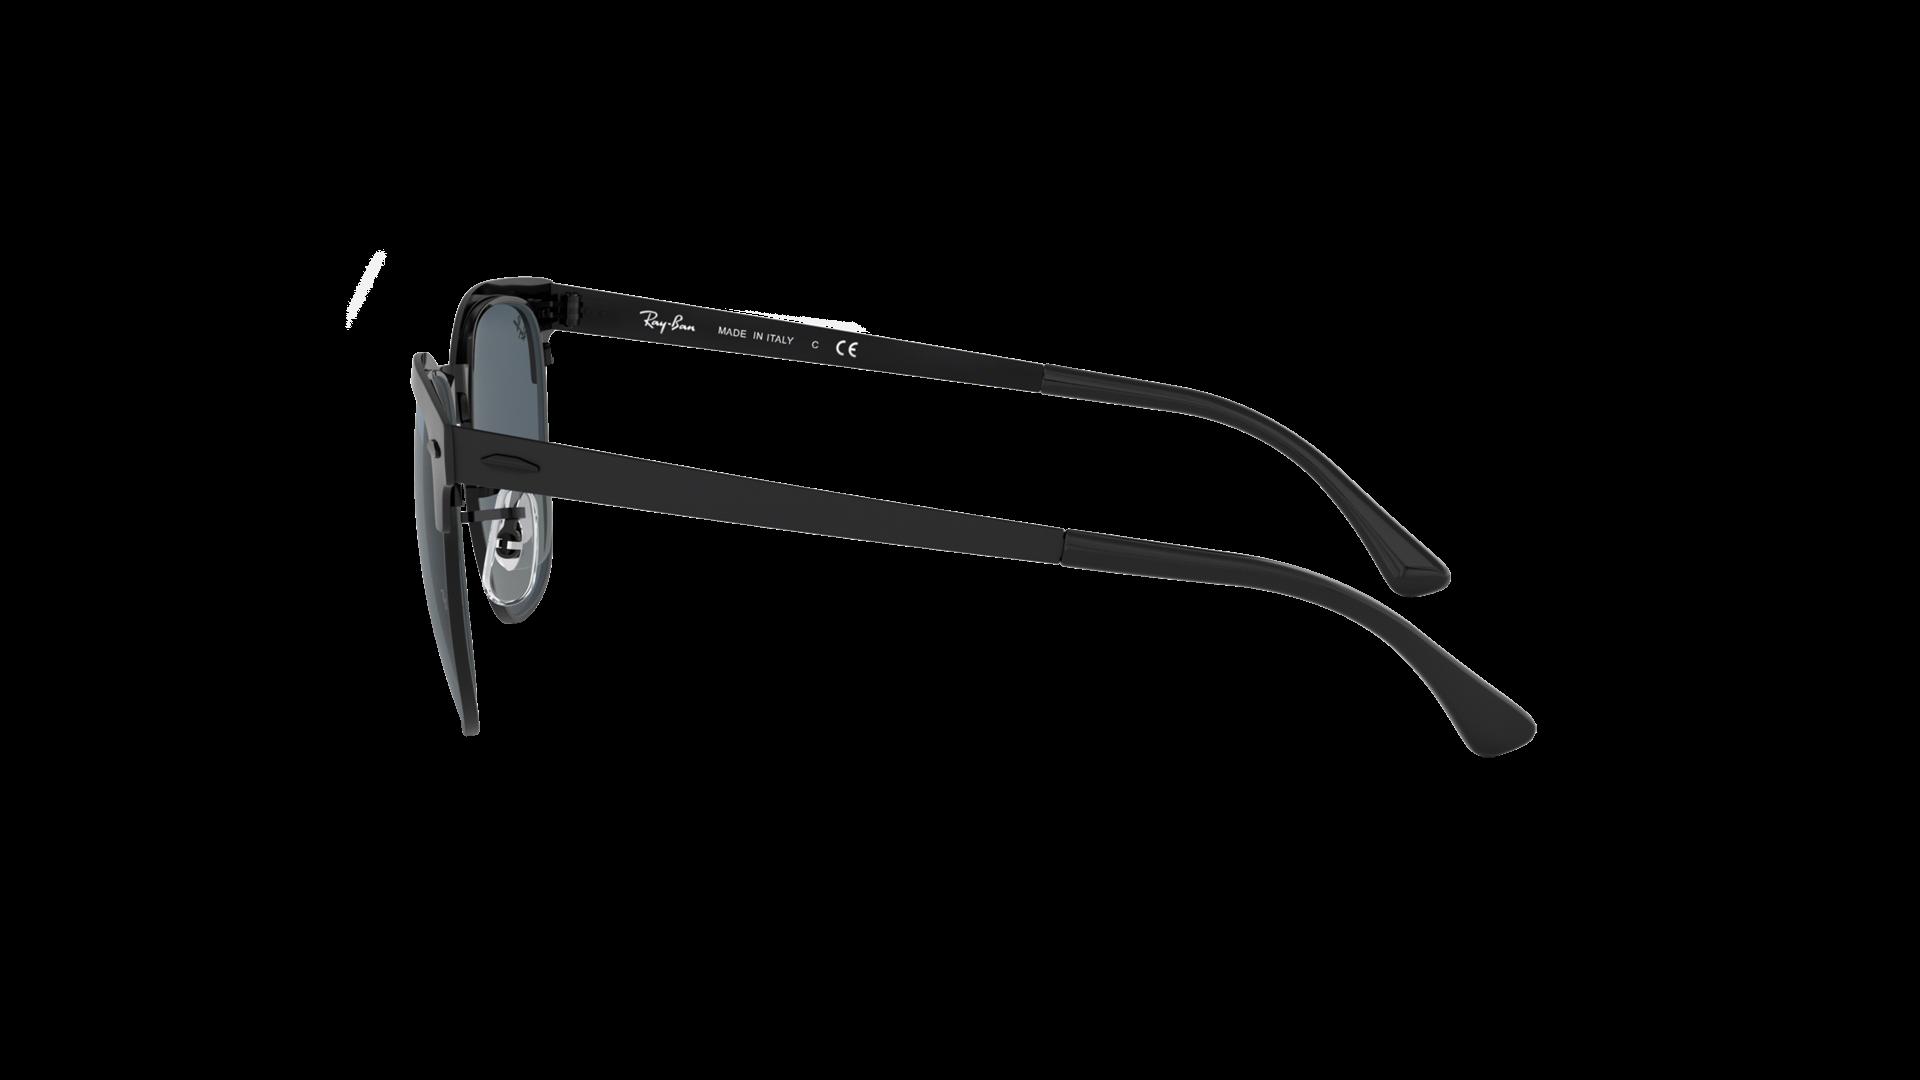 12b6a5c0a509f Sunglasses Ray-Ban Clubmaster Metal Black Matte RB3716 186 R5 51-21 Medium